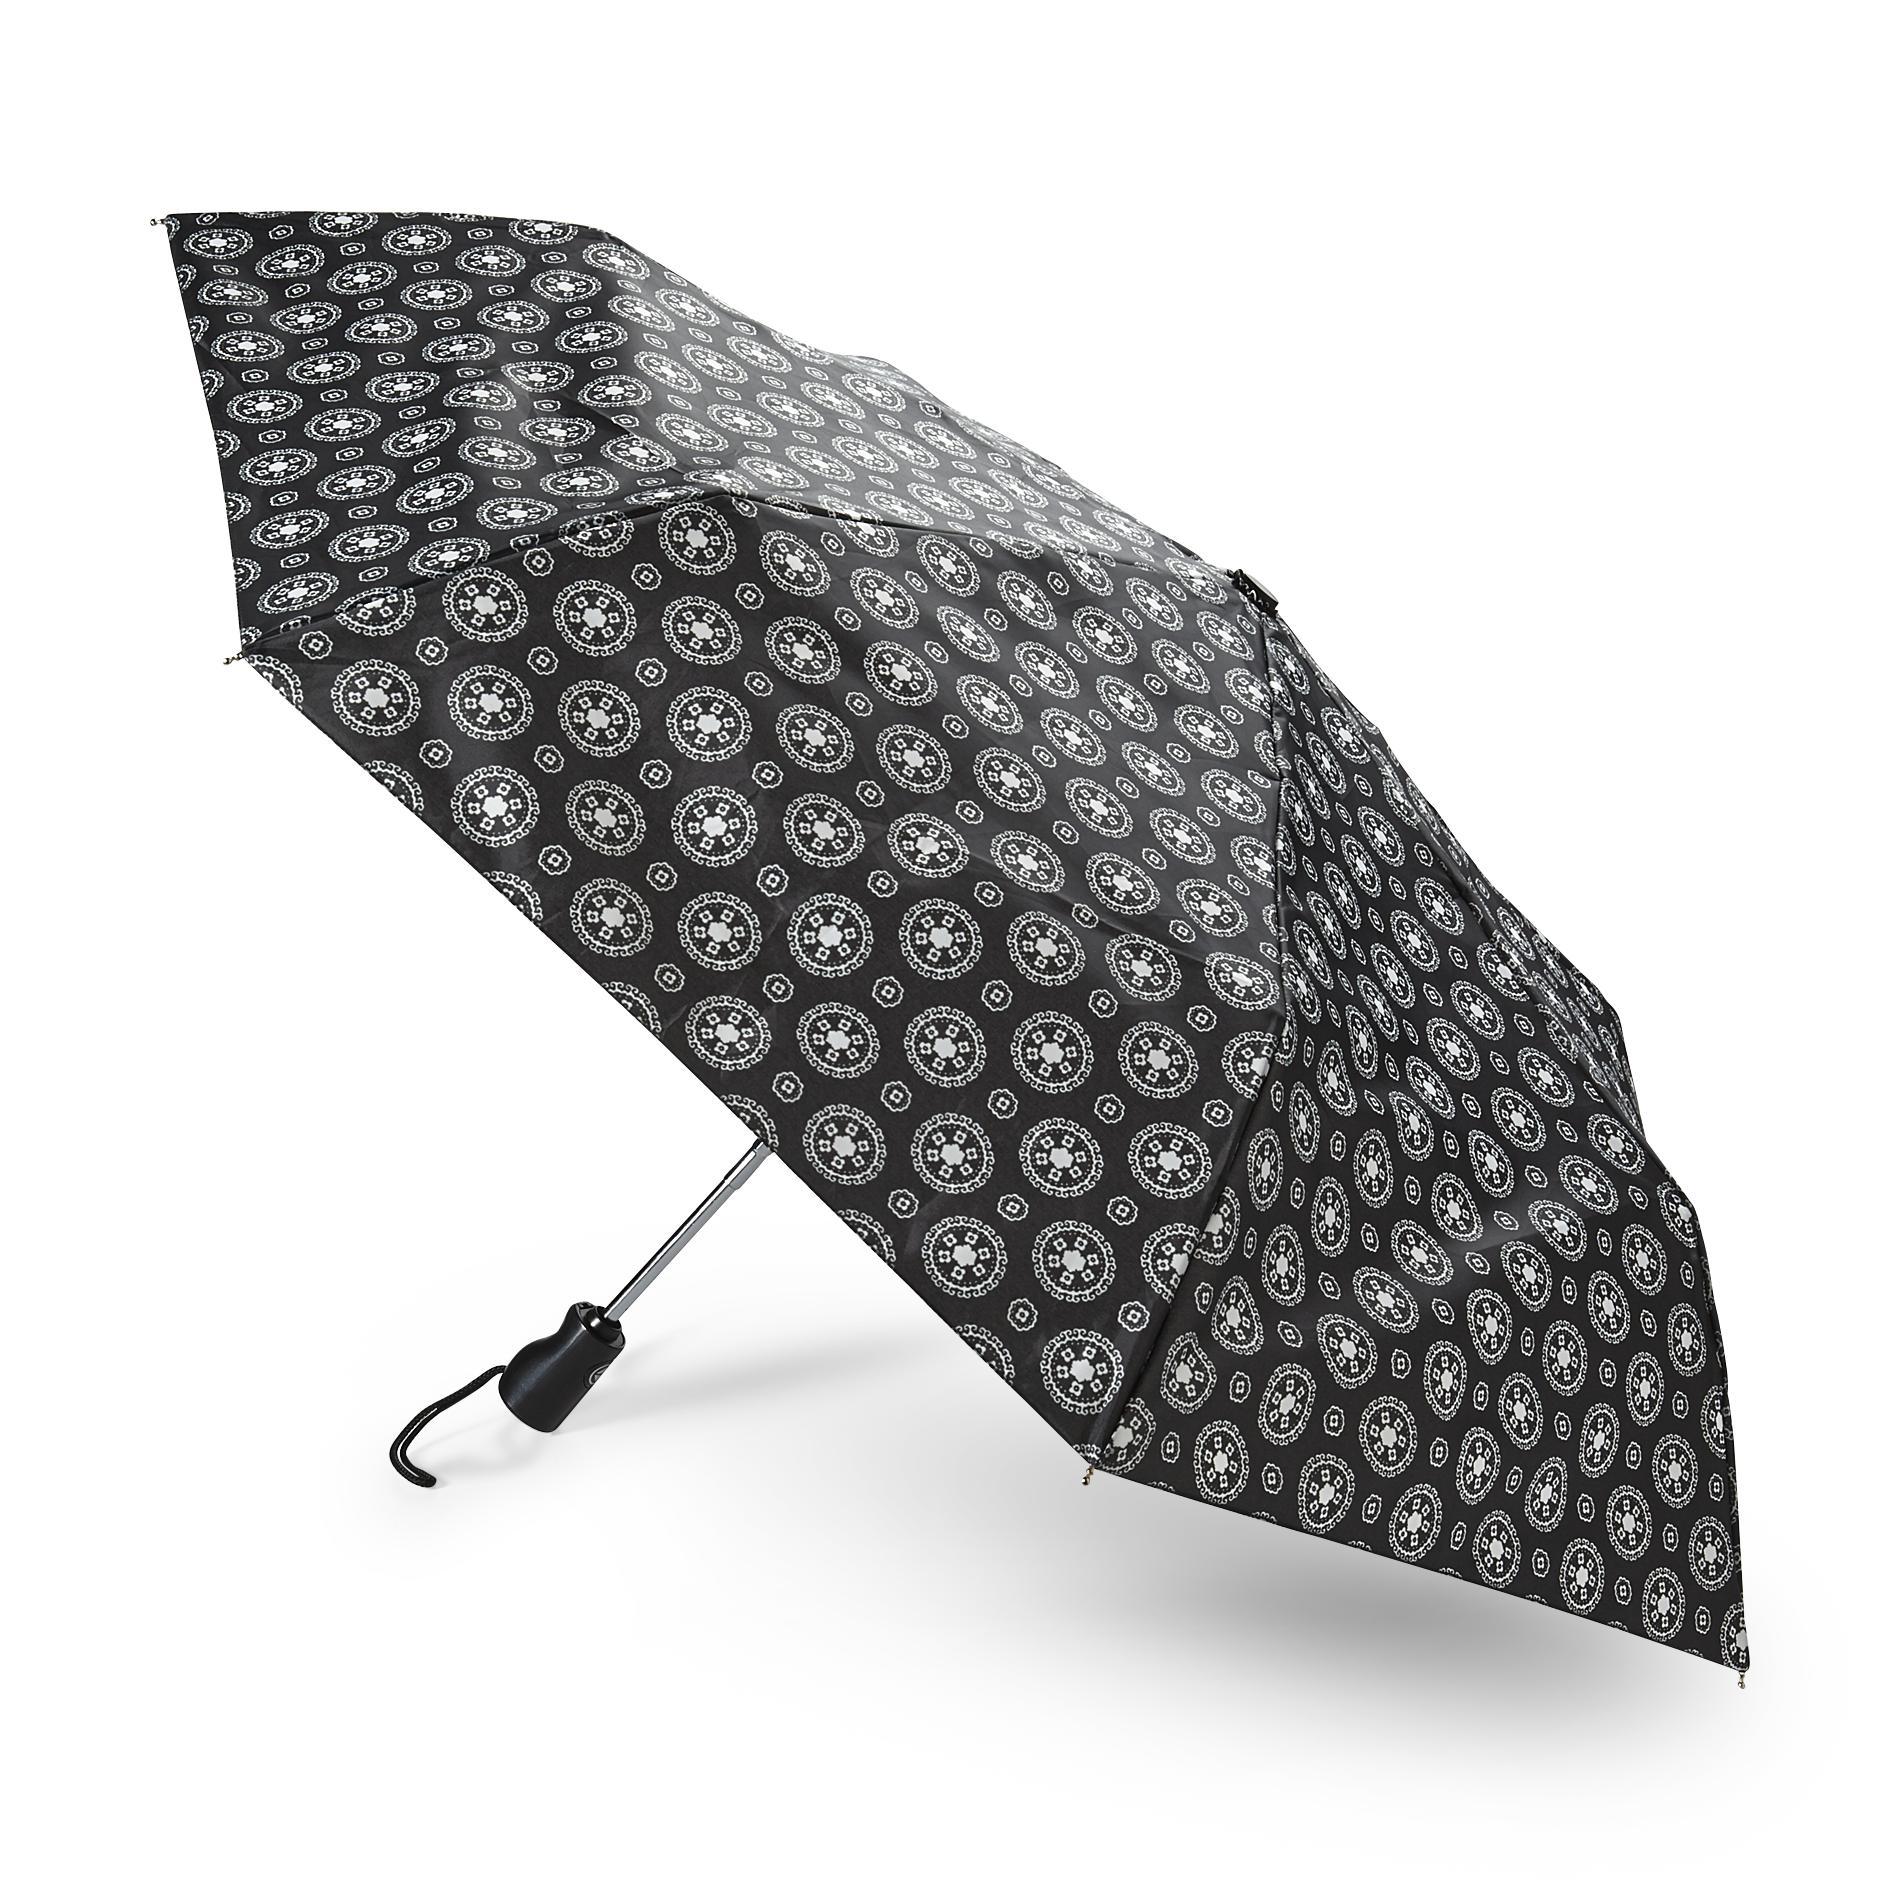 Totes Mini Automatic Umbrella - Foulard Print, Size: Small